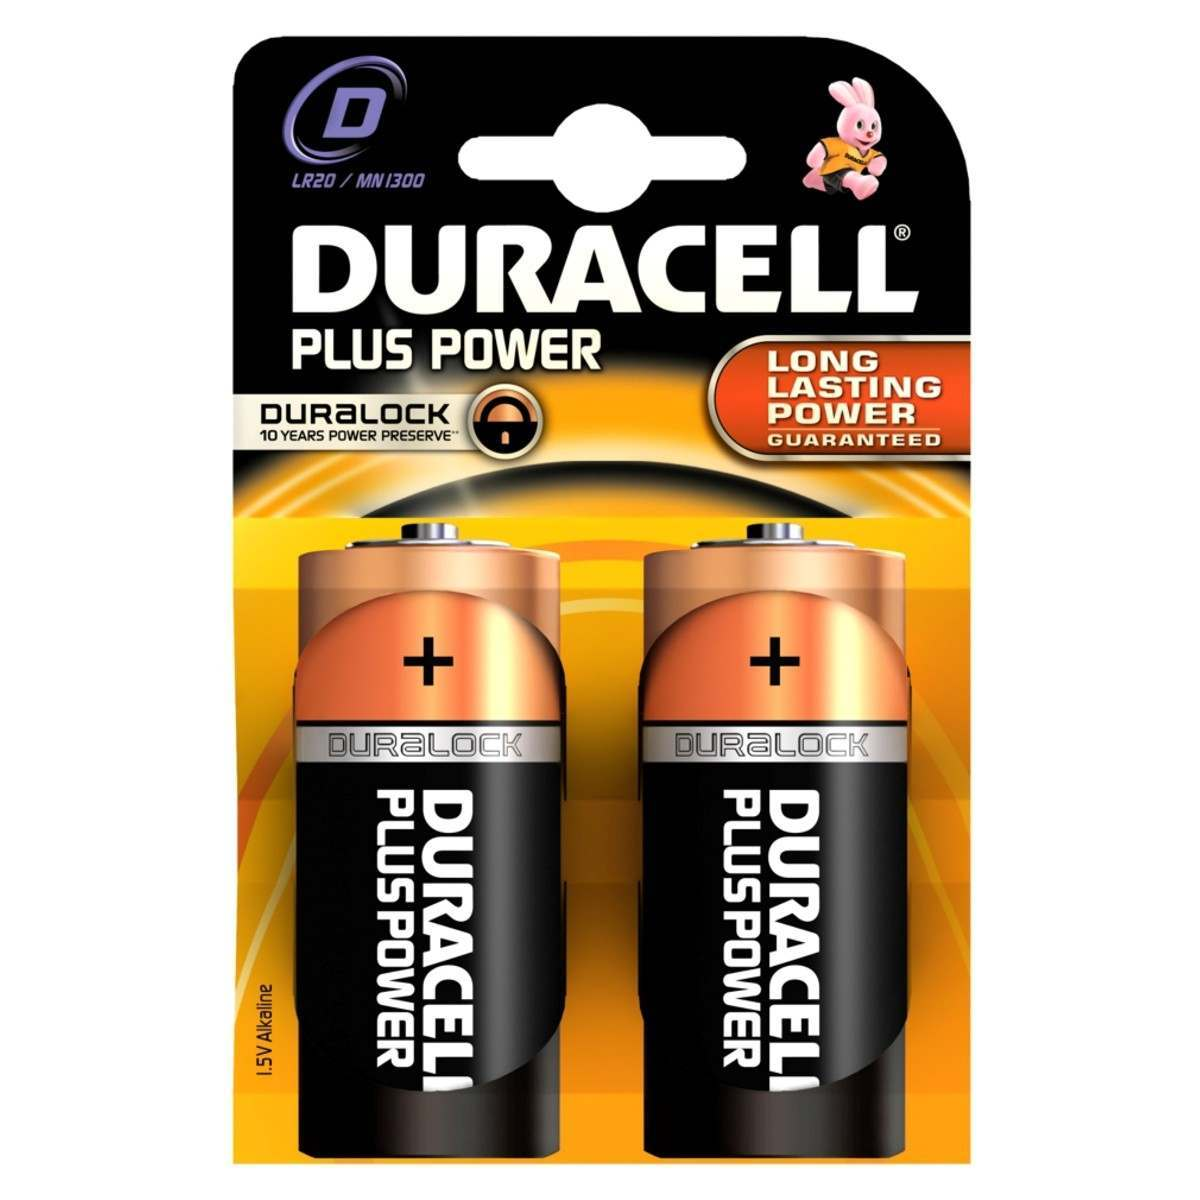 Duracell Alkaline Batteries D (Type) Pack of 2